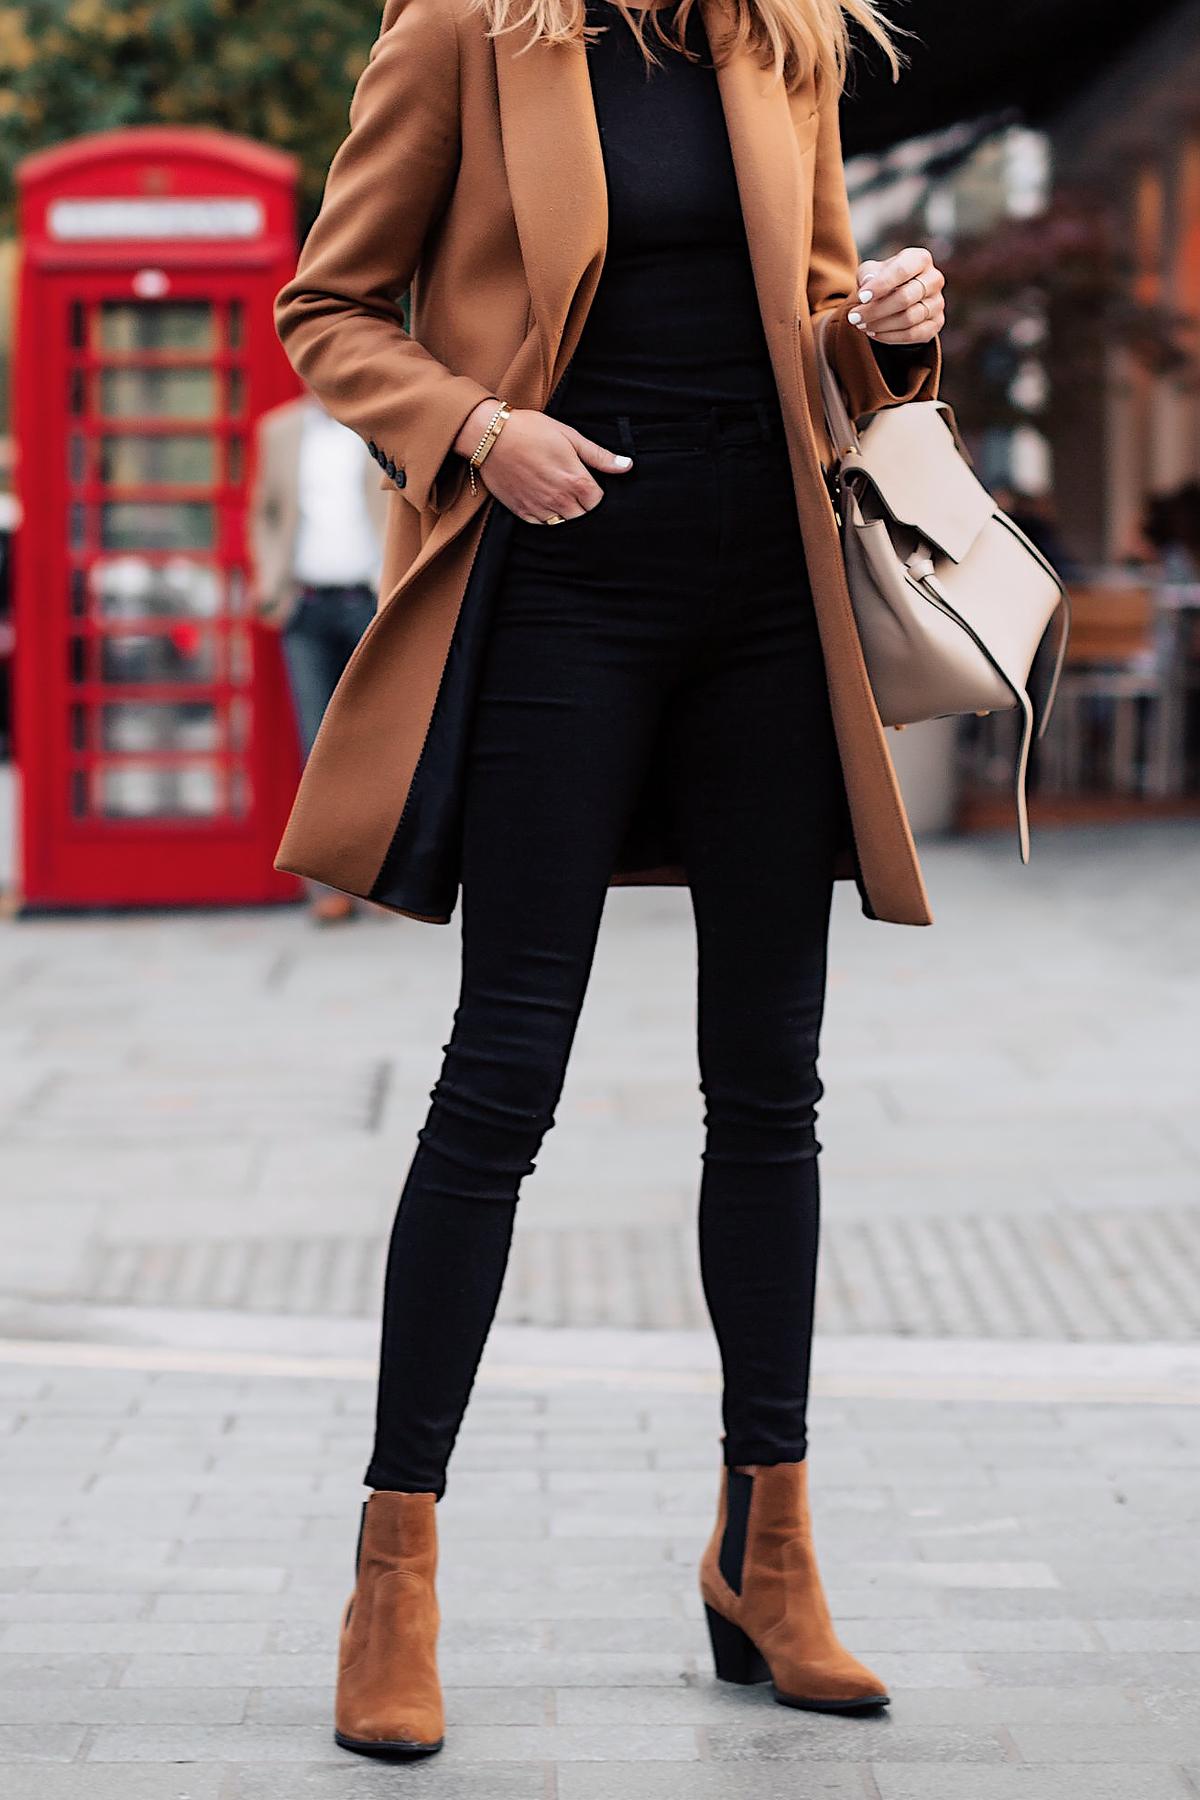 Woman Wearing Zara Camel Coat Black Sweater Black Skinny Jeans Tan Booties Outfit Celine Belt Bag Fashion Jackson San Diego Fashion Blogger London Street Style